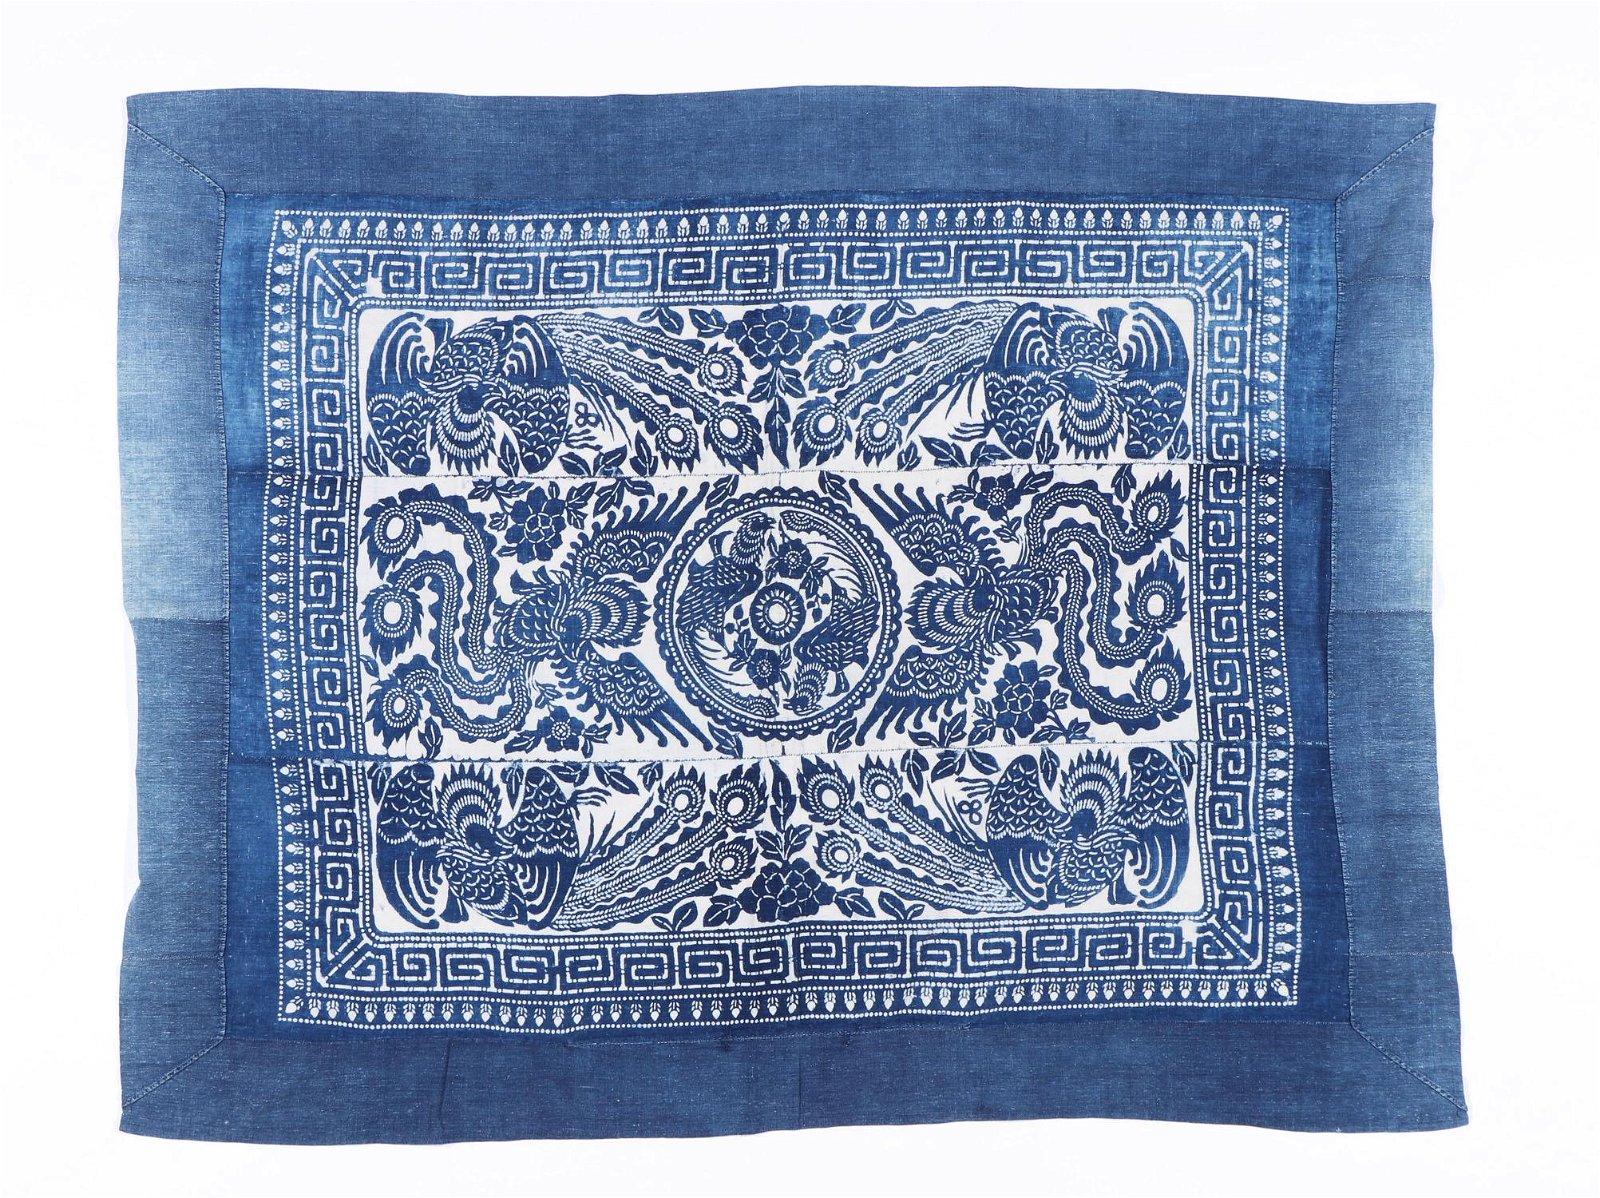 Old Miao Stenciled Batik Cotton Blanket, China